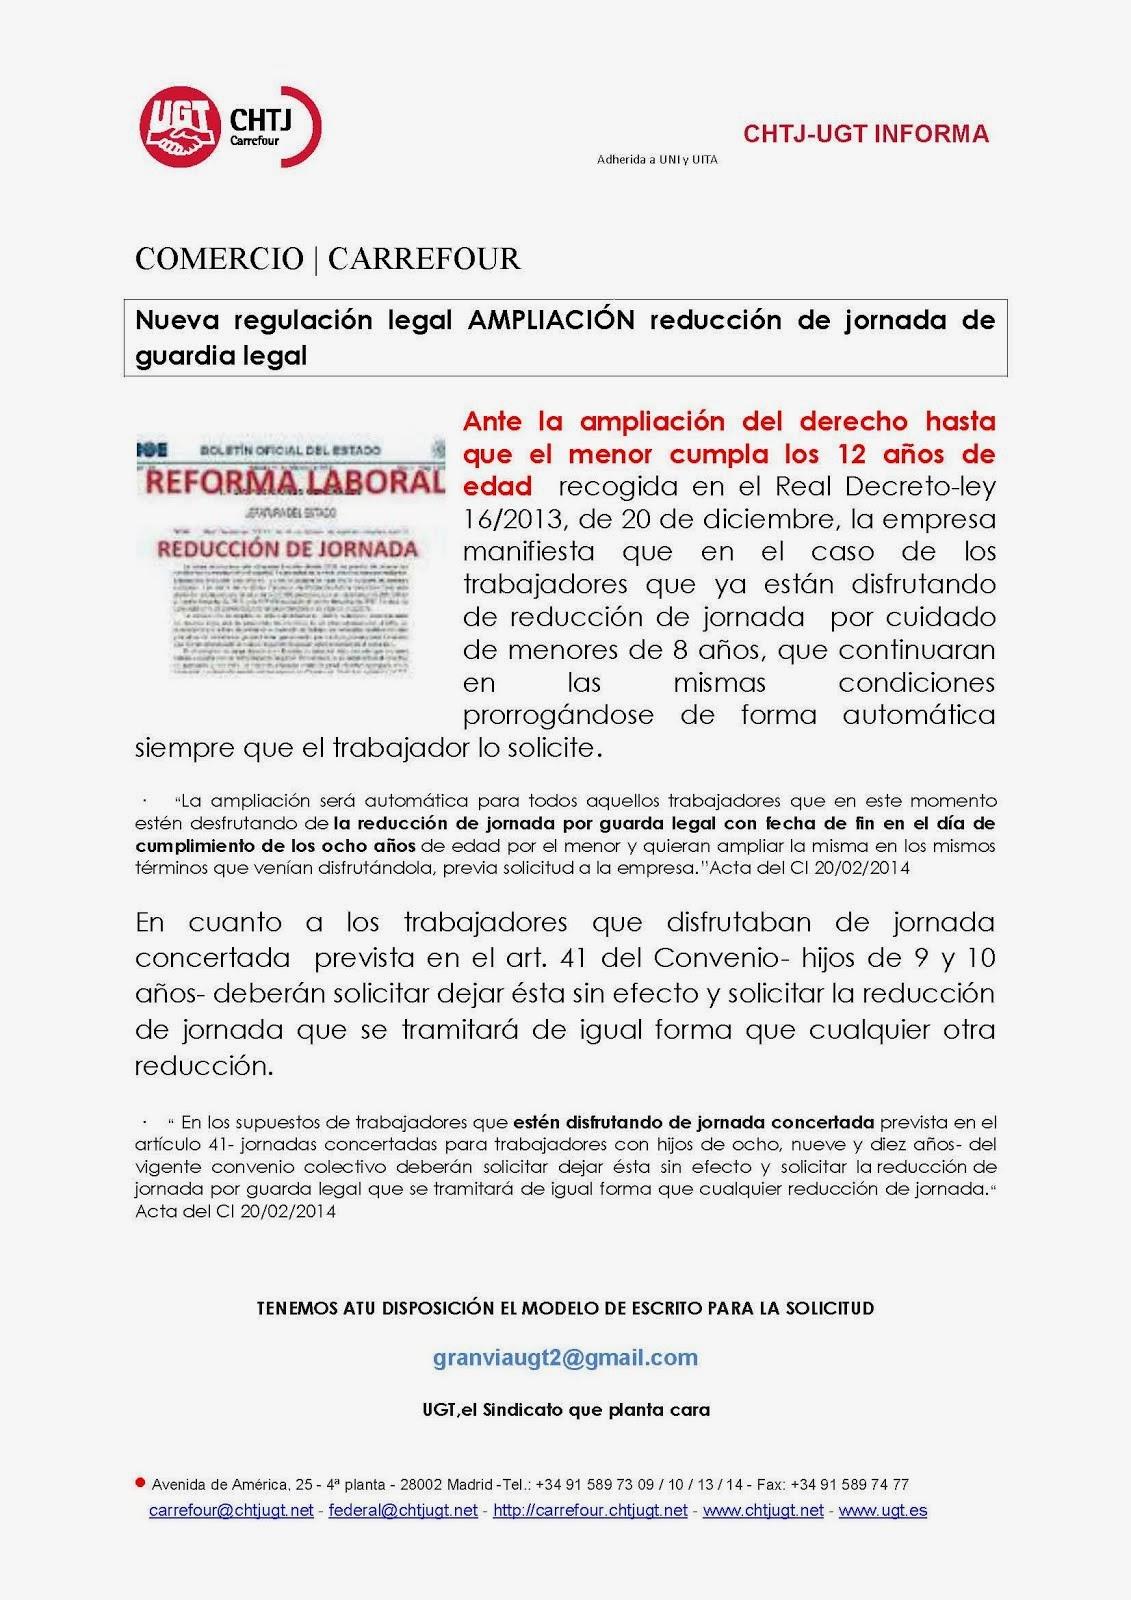 Carrefour Ugt Agosto 2014